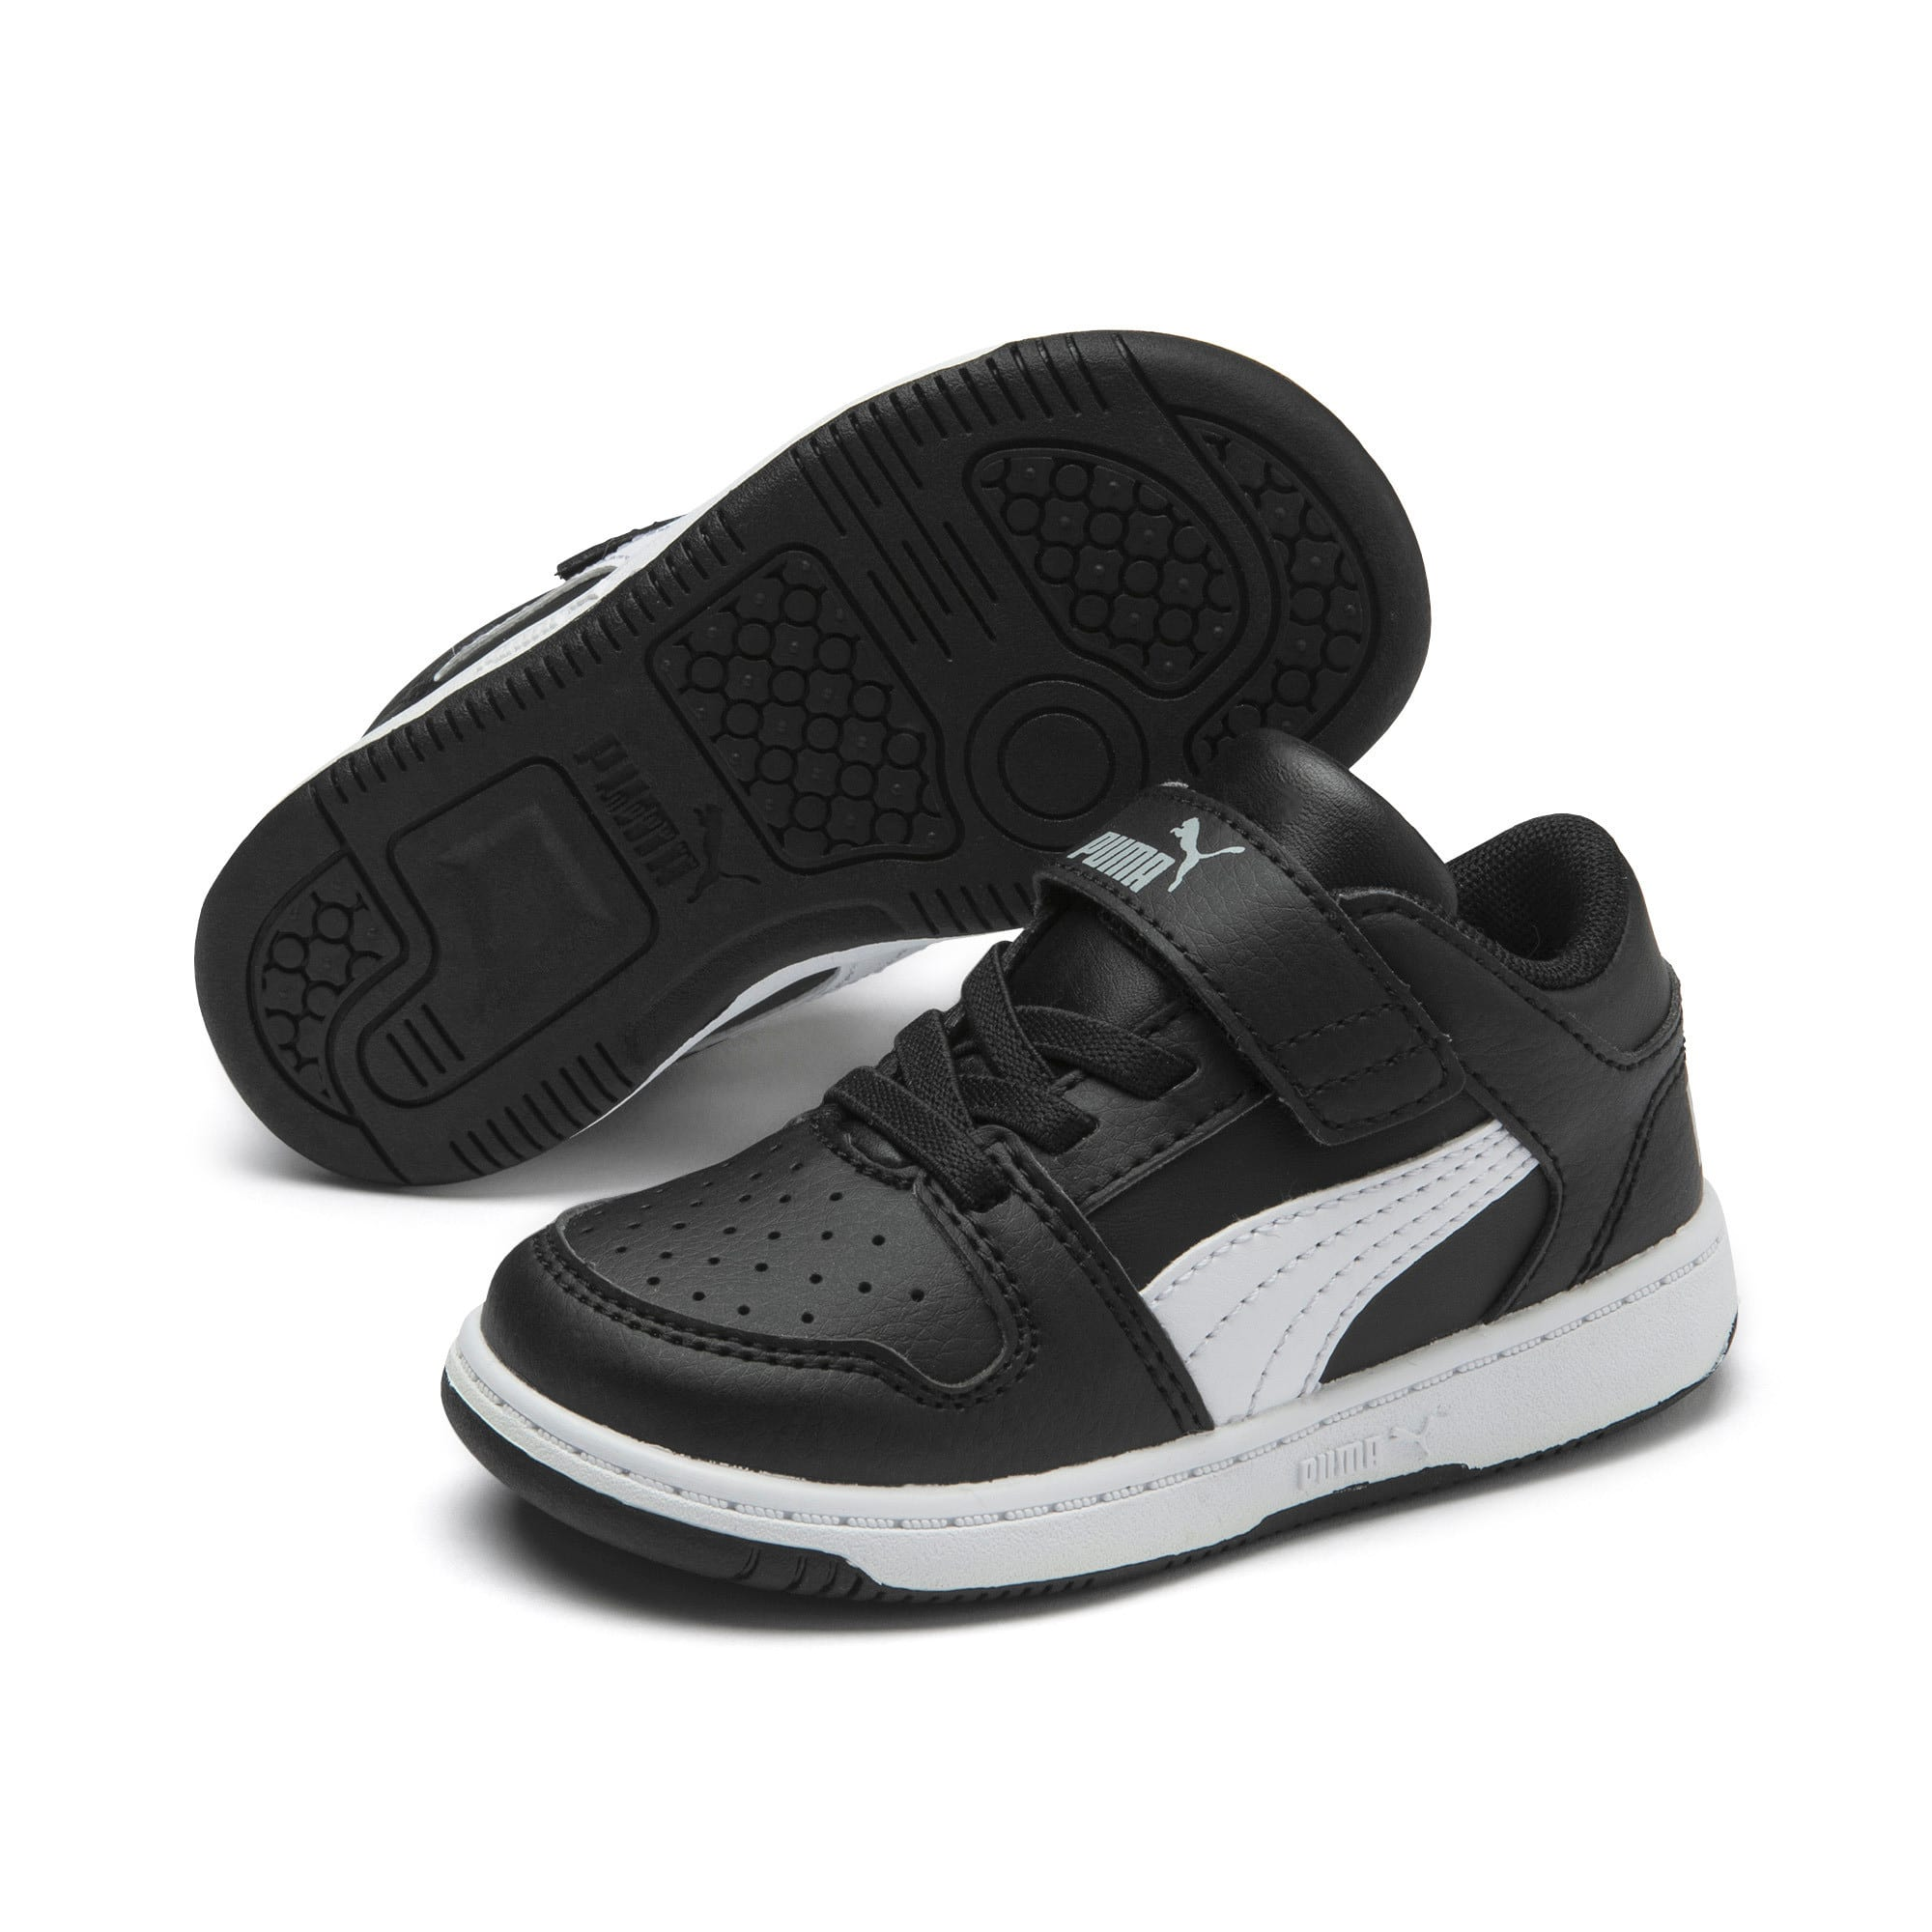 Miniatura 2 de Zapatos deportivos PUMA Rebound LayUp Lo para INF, Puma Black-Blanco-High Rise, mediano